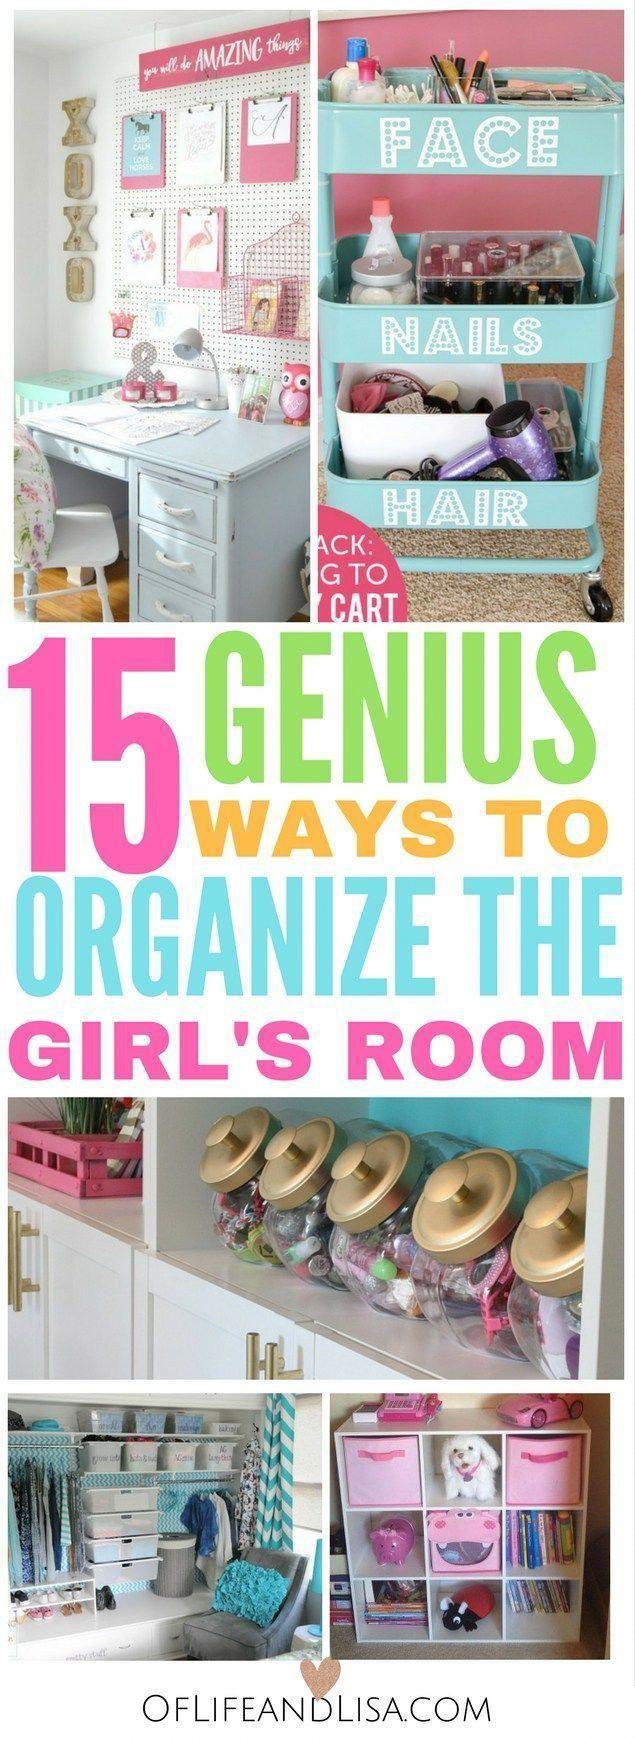 e40b83e75d8967e1571752ea25ad8644 - 15 Gorgeous Ways to Quickly Organize the Girls' Room